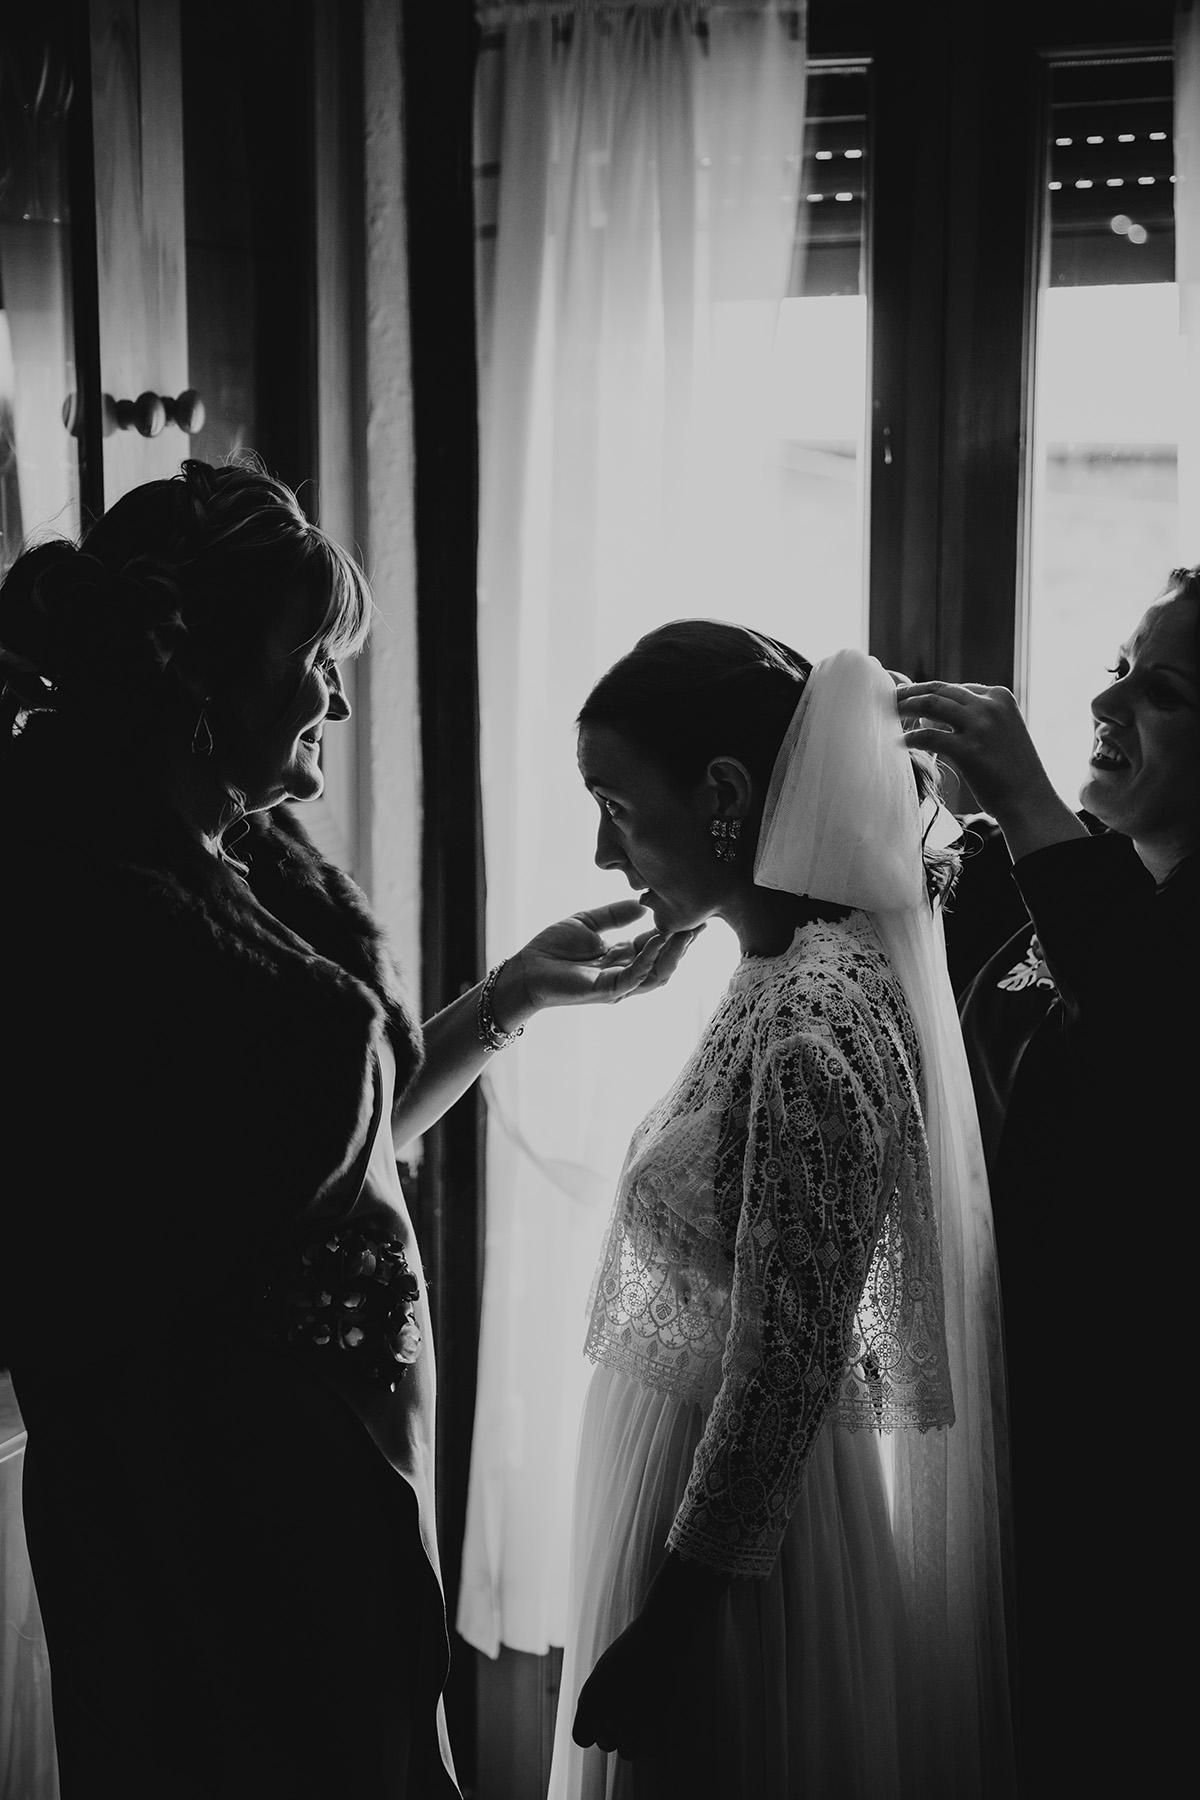 Boda-civil-zaragoza-huesca-pineta-pirineos-aragon-jose-reyes-destination-wedding_007.jpg